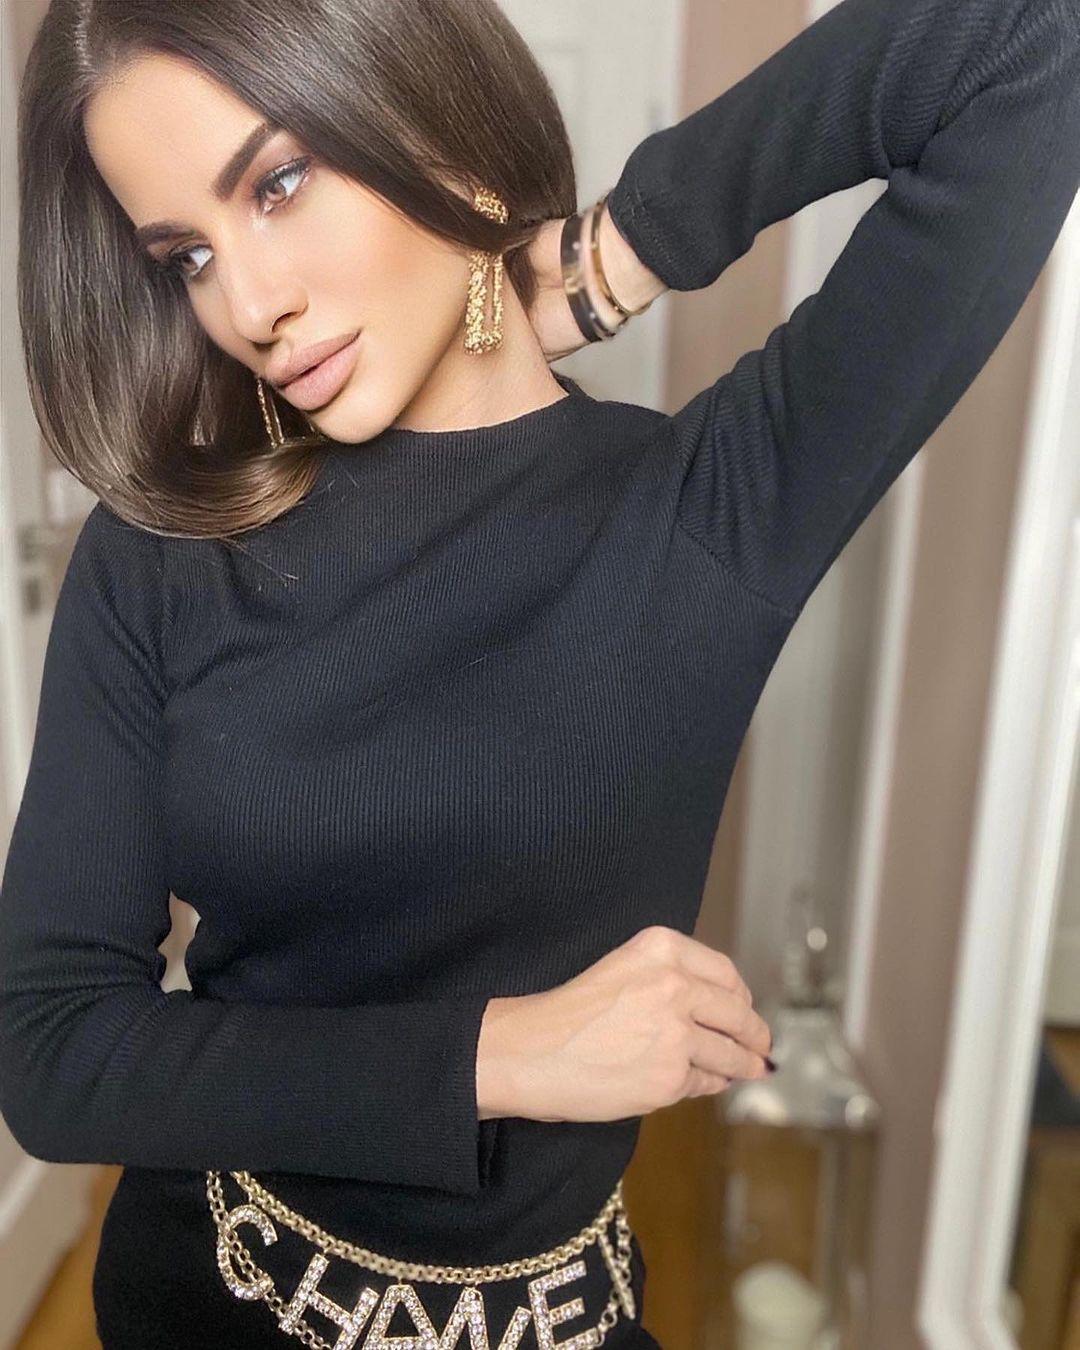 Paulina-Mai-Wallpapers-Insta-Fit-Bio-12